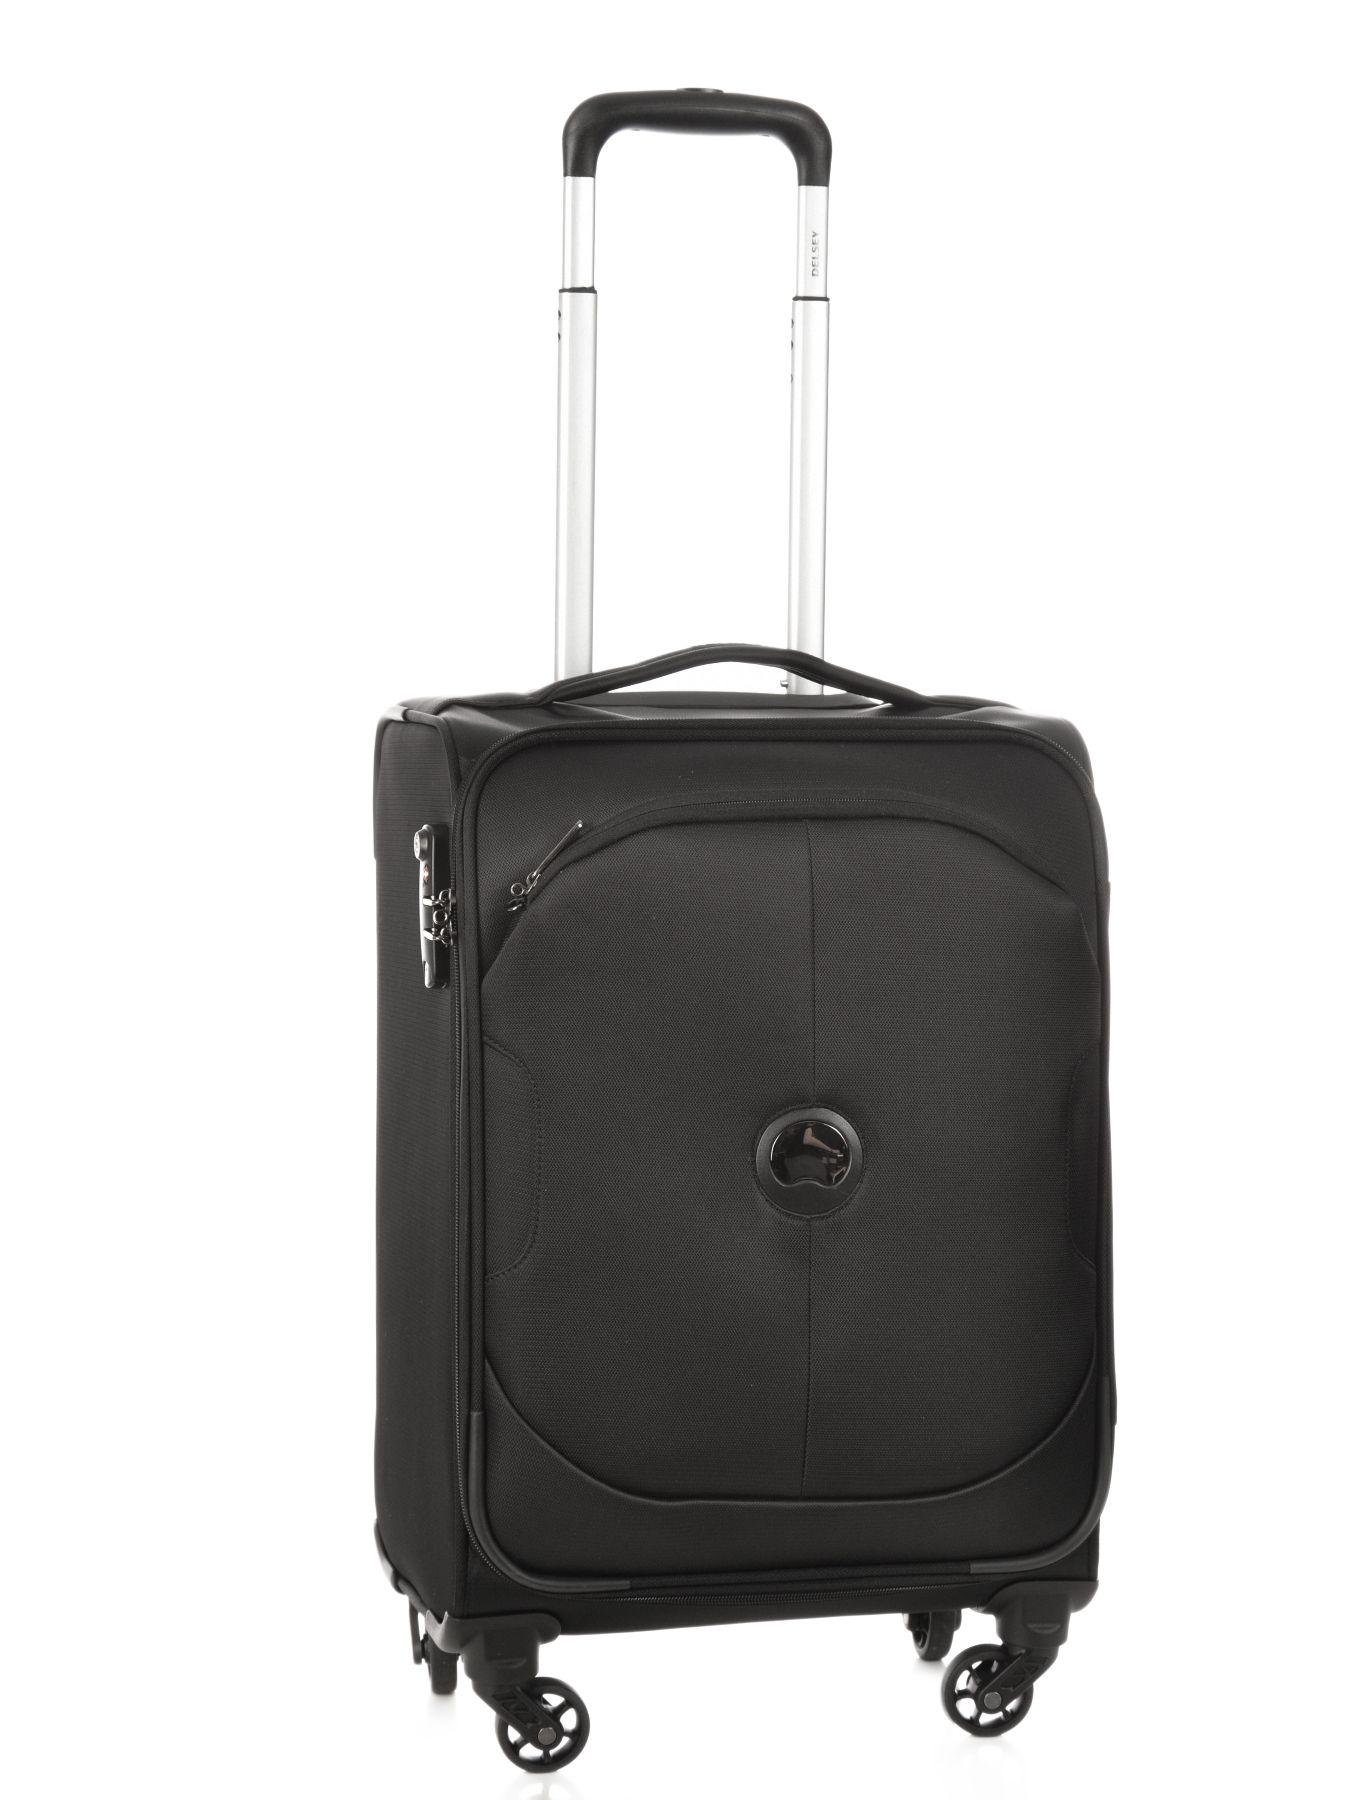 valise cabine delsey ulite classic noir en vente au meilleur prix. Black Bedroom Furniture Sets. Home Design Ideas